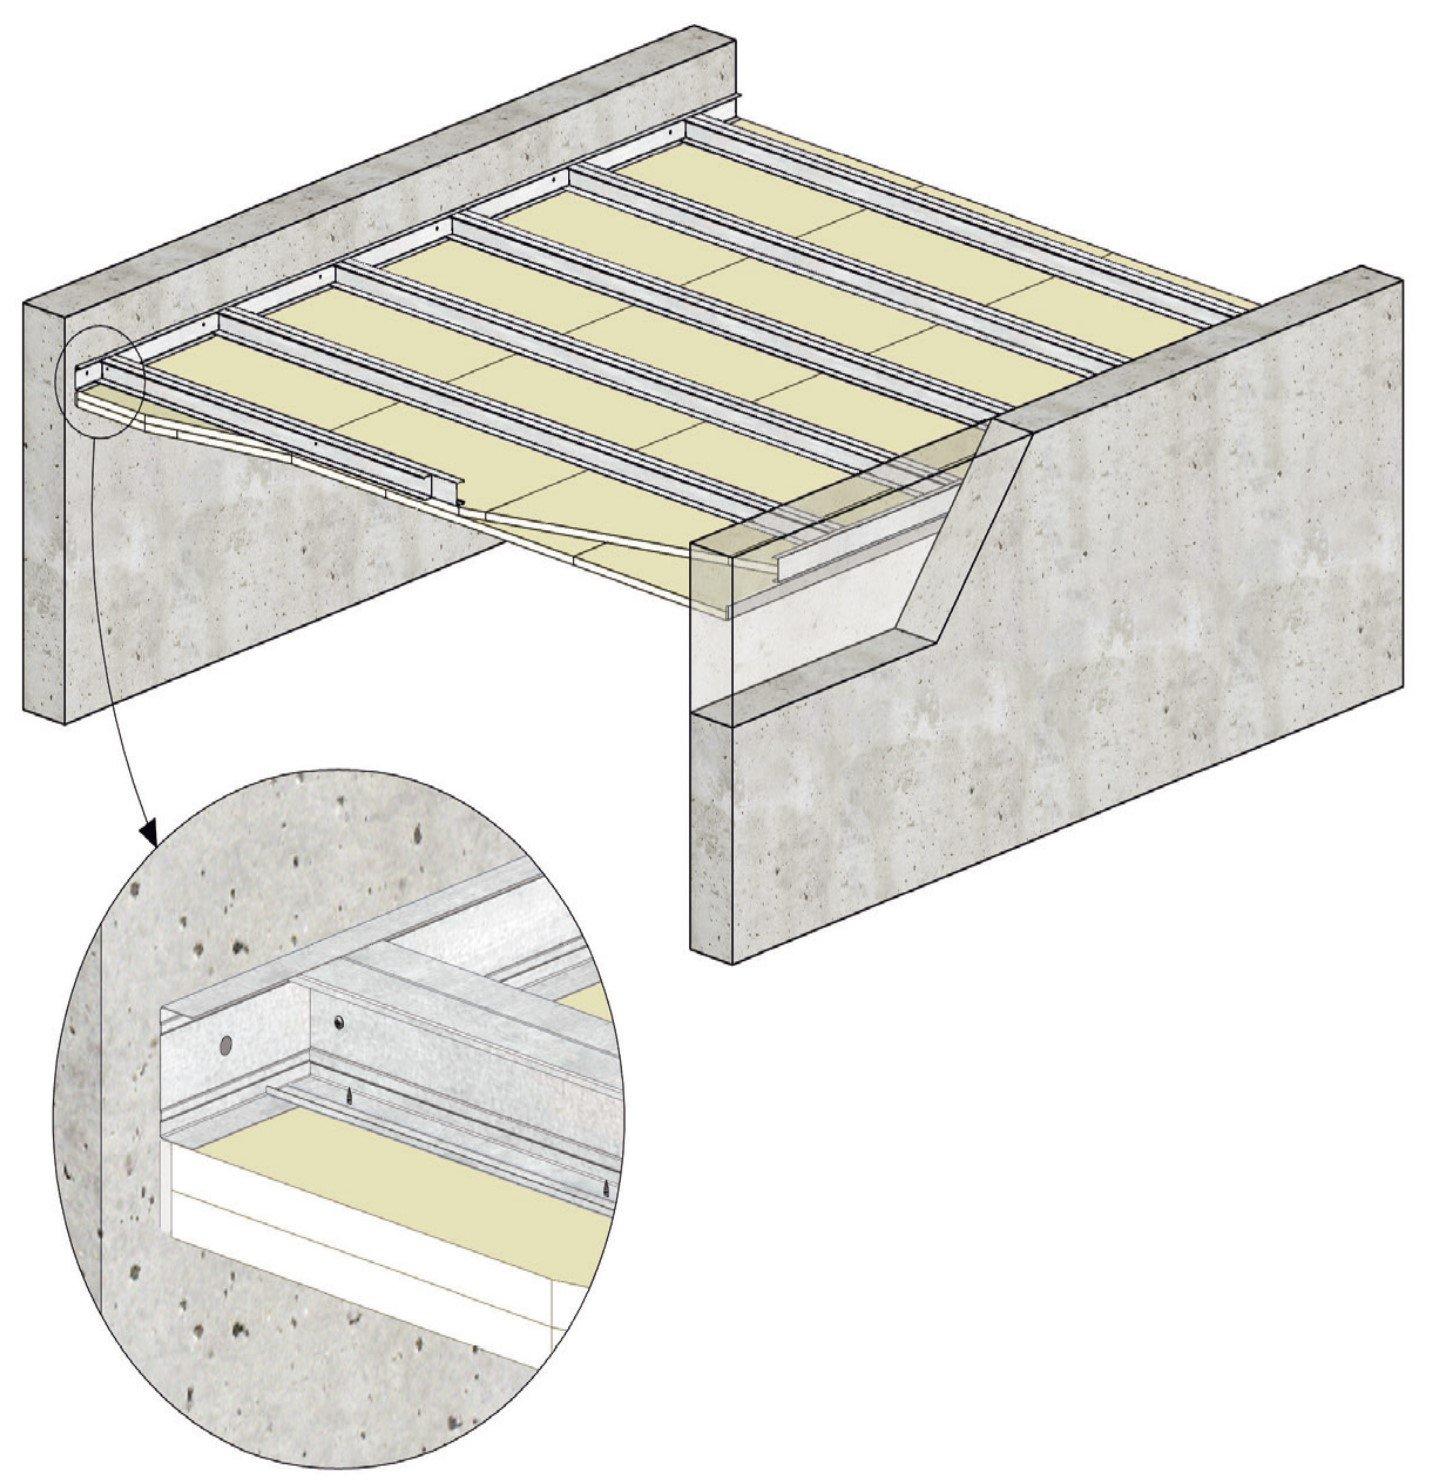 faux plafond autoportant knauf isolation id es. Black Bedroom Furniture Sets. Home Design Ideas